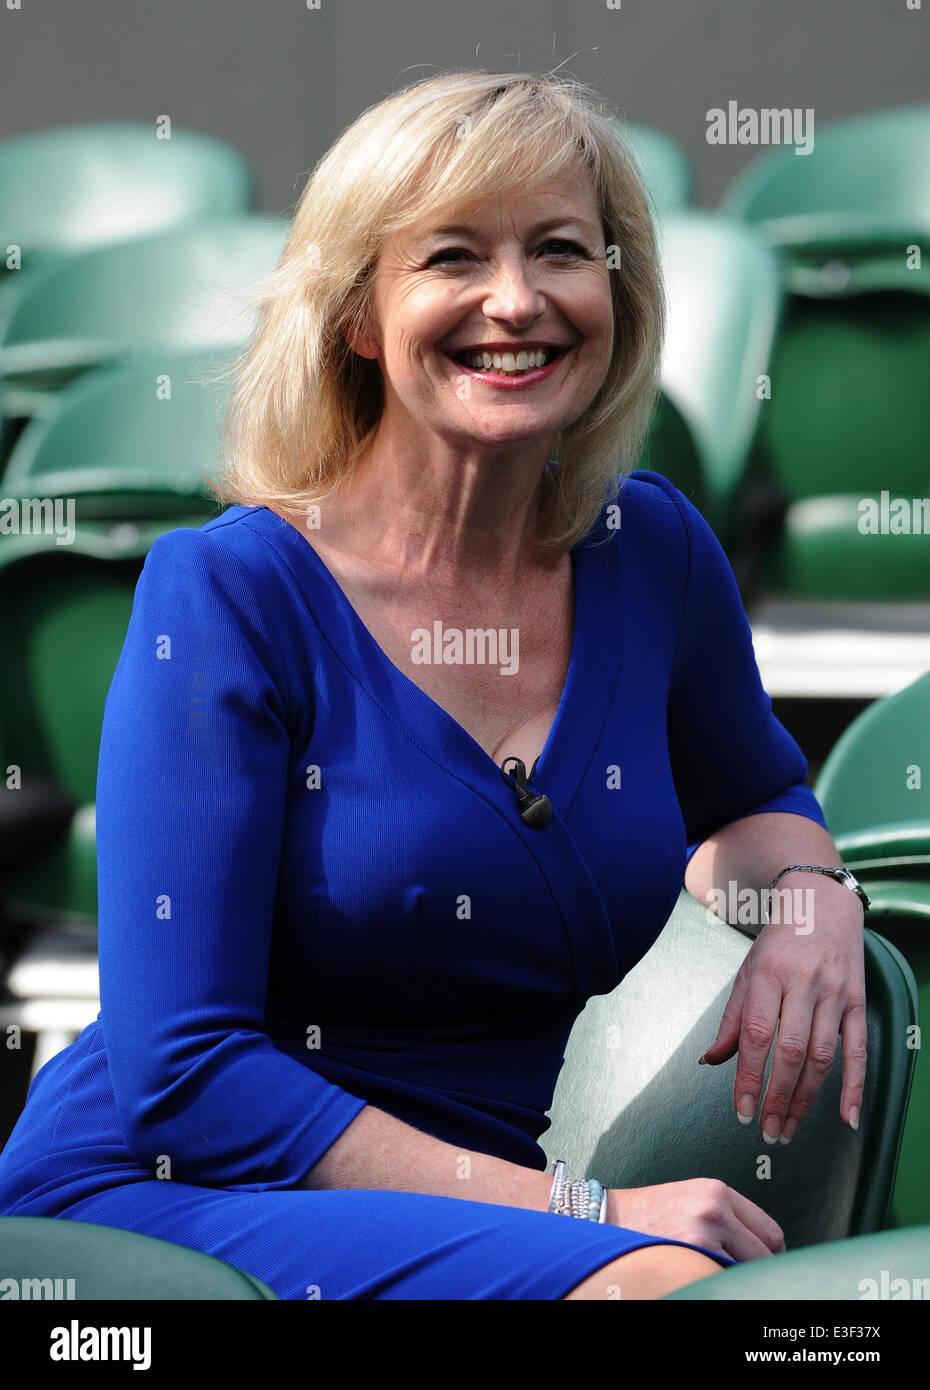 CAROL KIRKWOOD BBC WEATHER PRESENTER THE ALL ENGLAND TENNIS CLUB WIMBLEDON LONDON ENGLAND 23 June 2014 - Stock Image